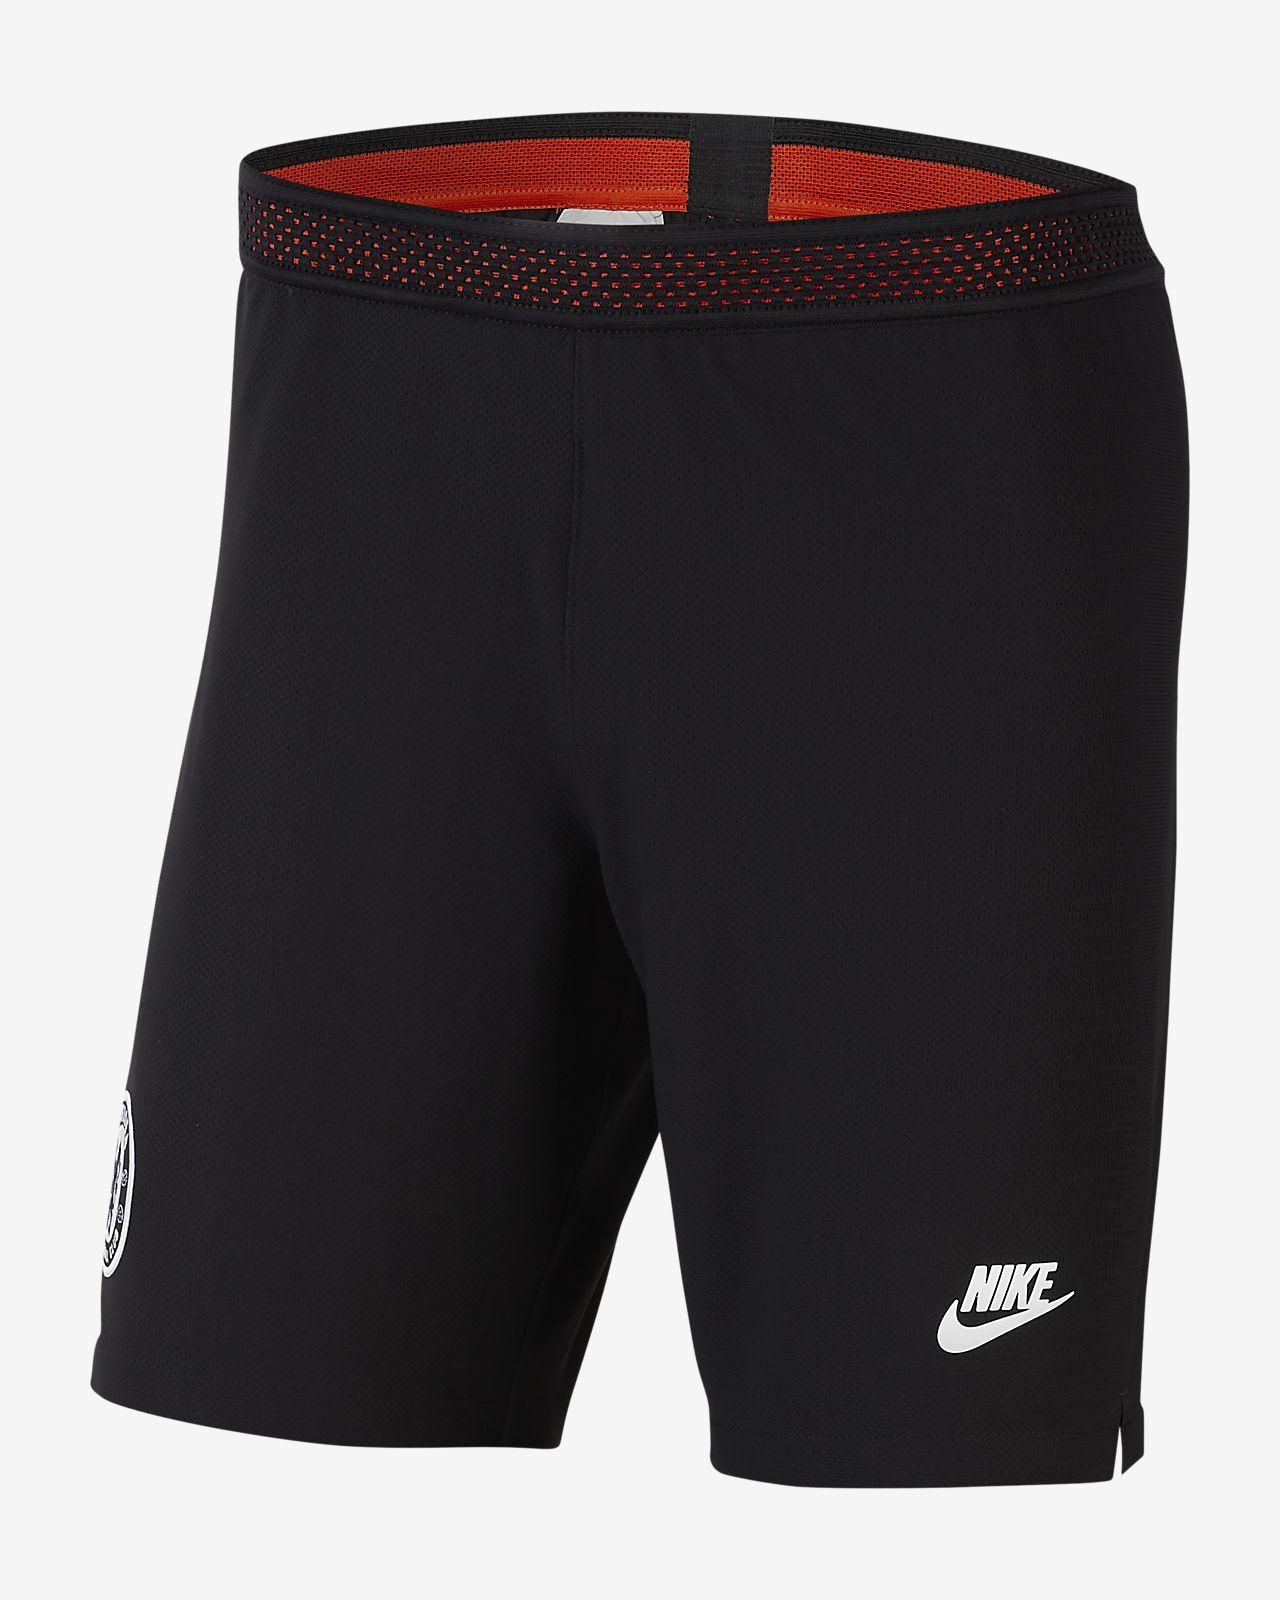 Shortes de fútbol alternativos para hombre Vapor Match del Chelsea FC 2019/20